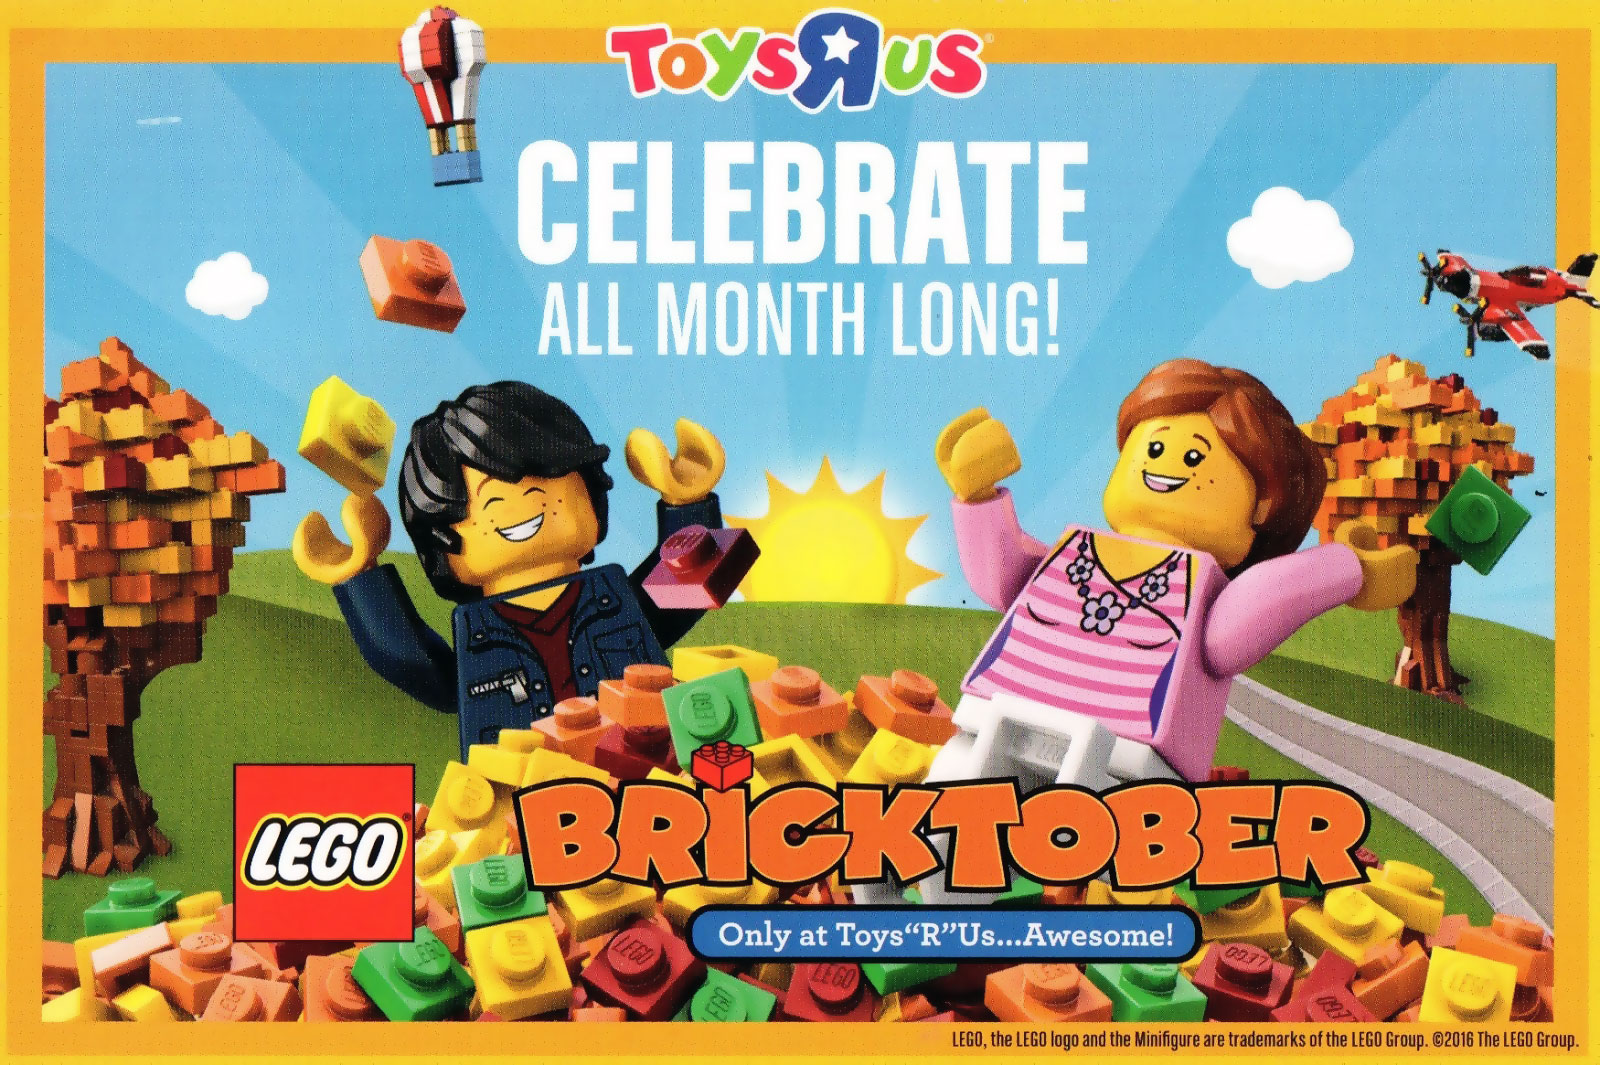 Bricktober 2018 rumours